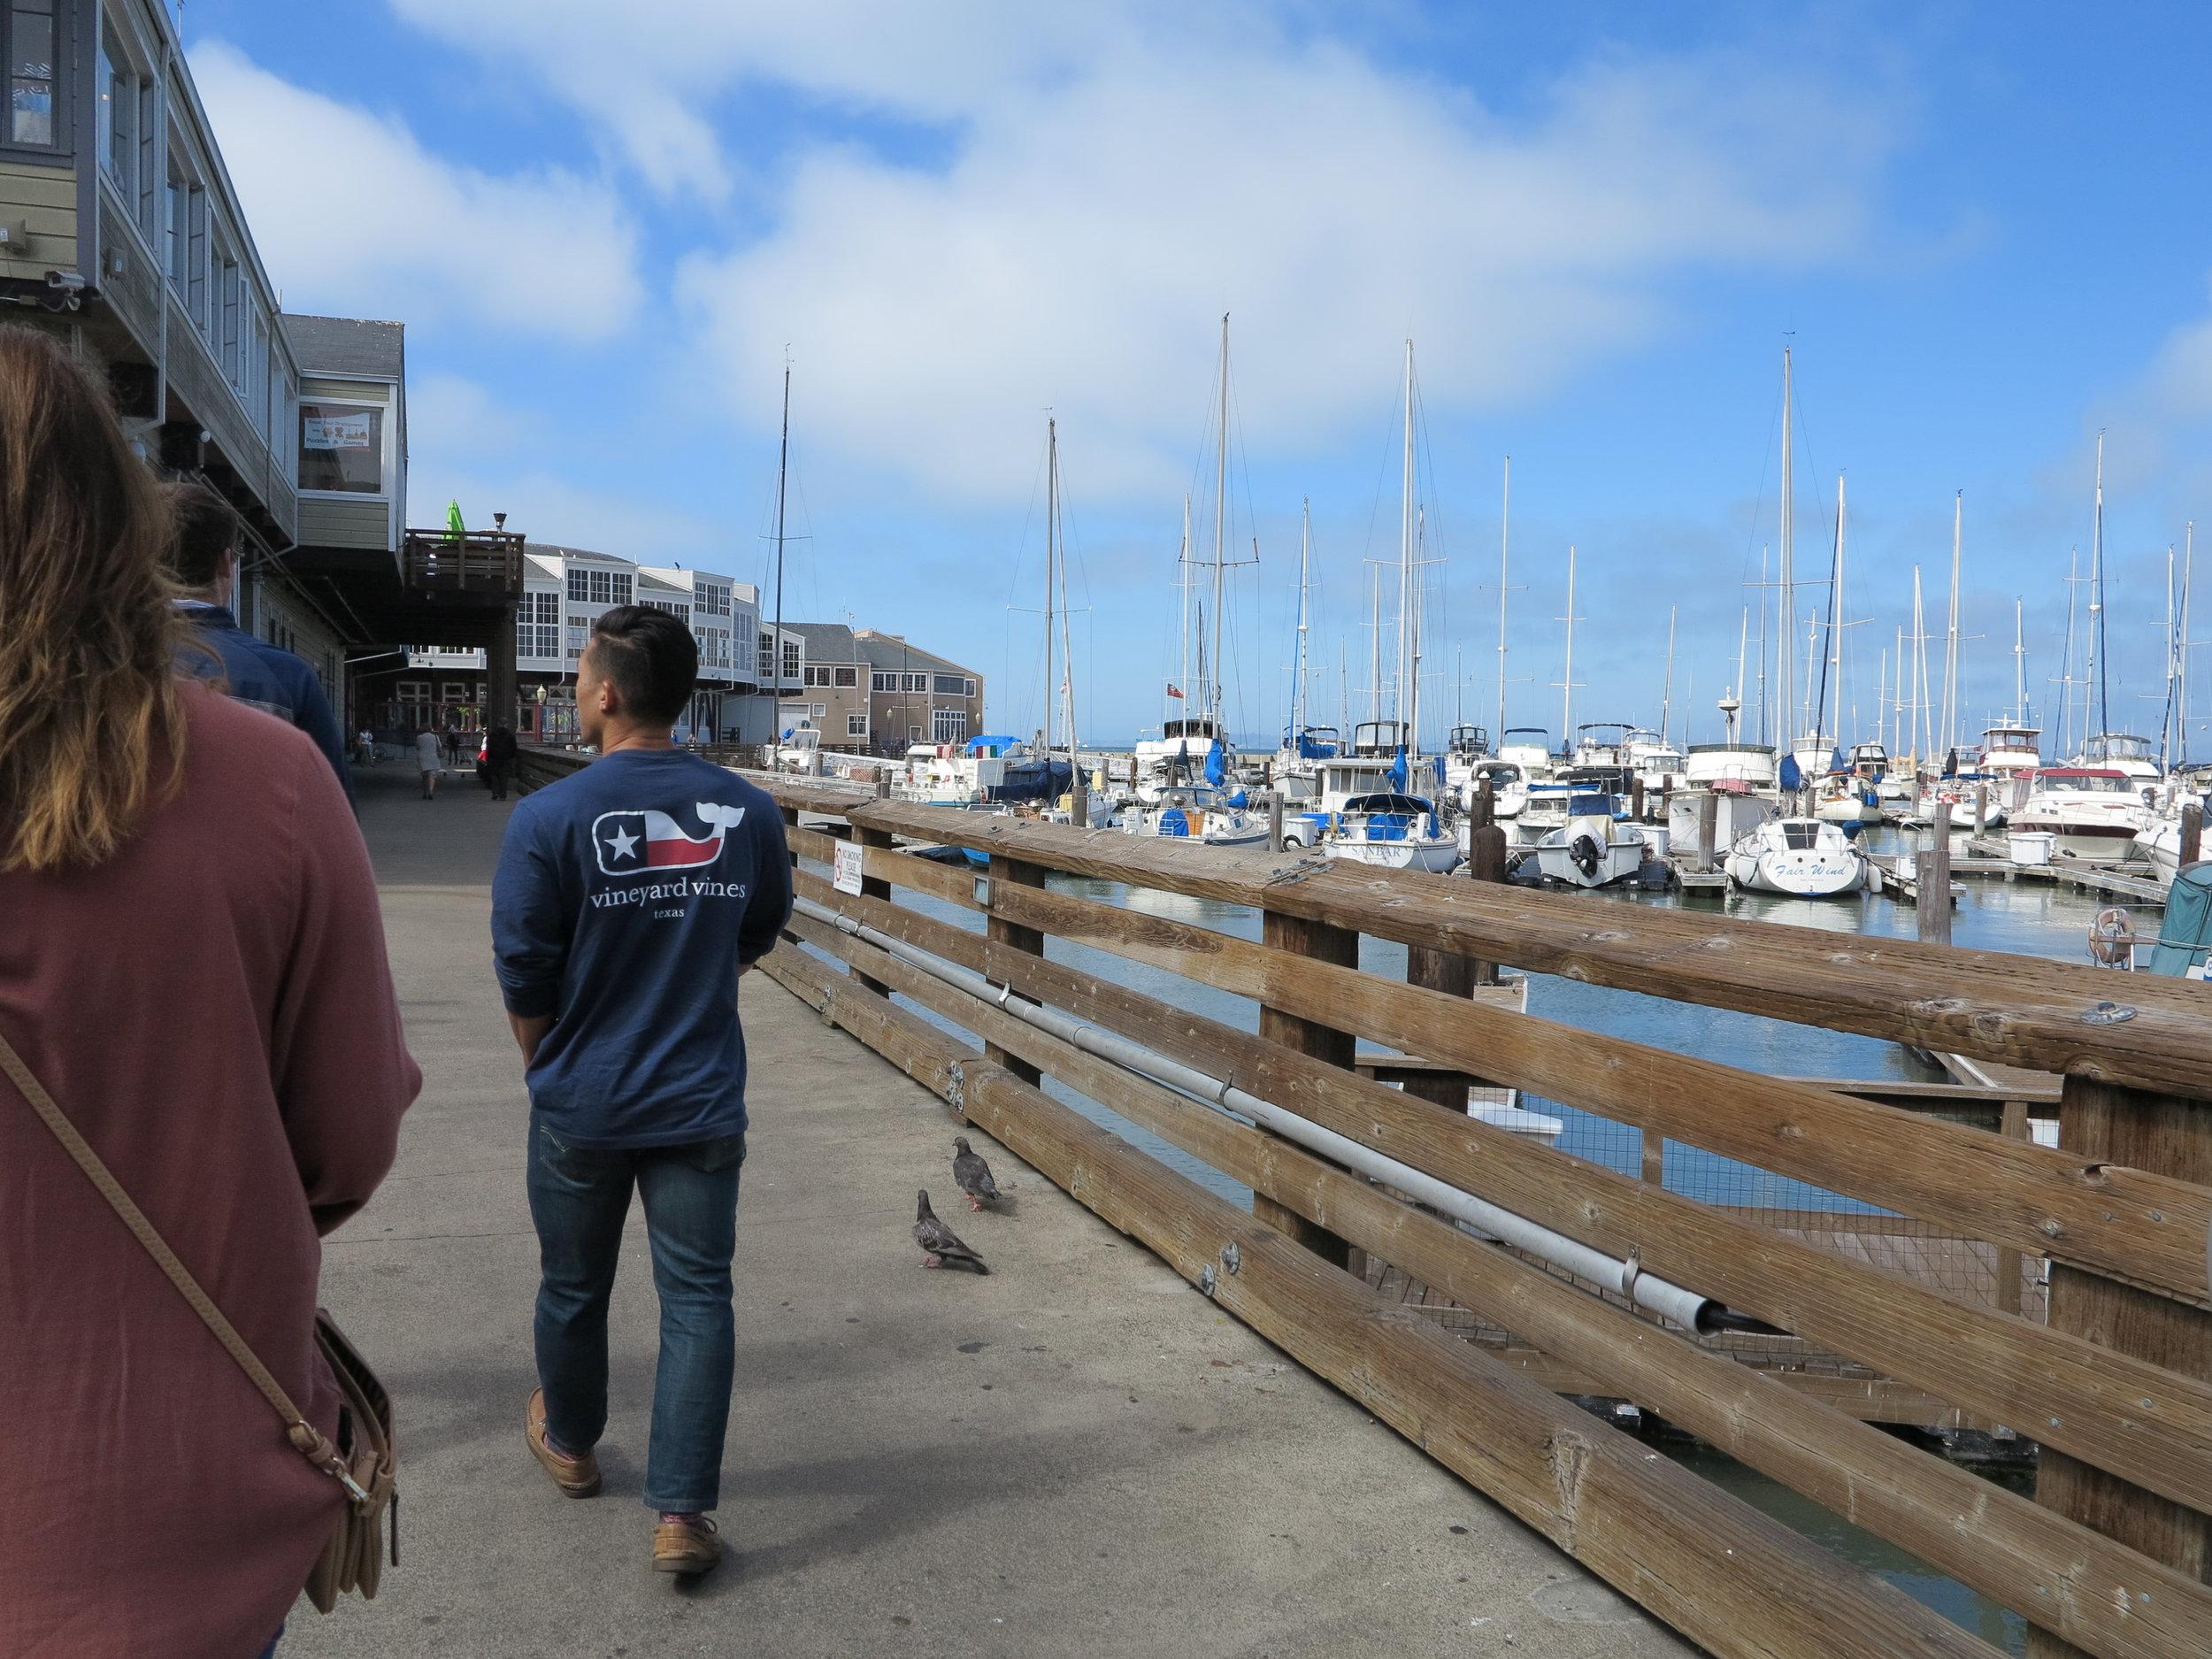 We walked around the Marina near Pier 39.